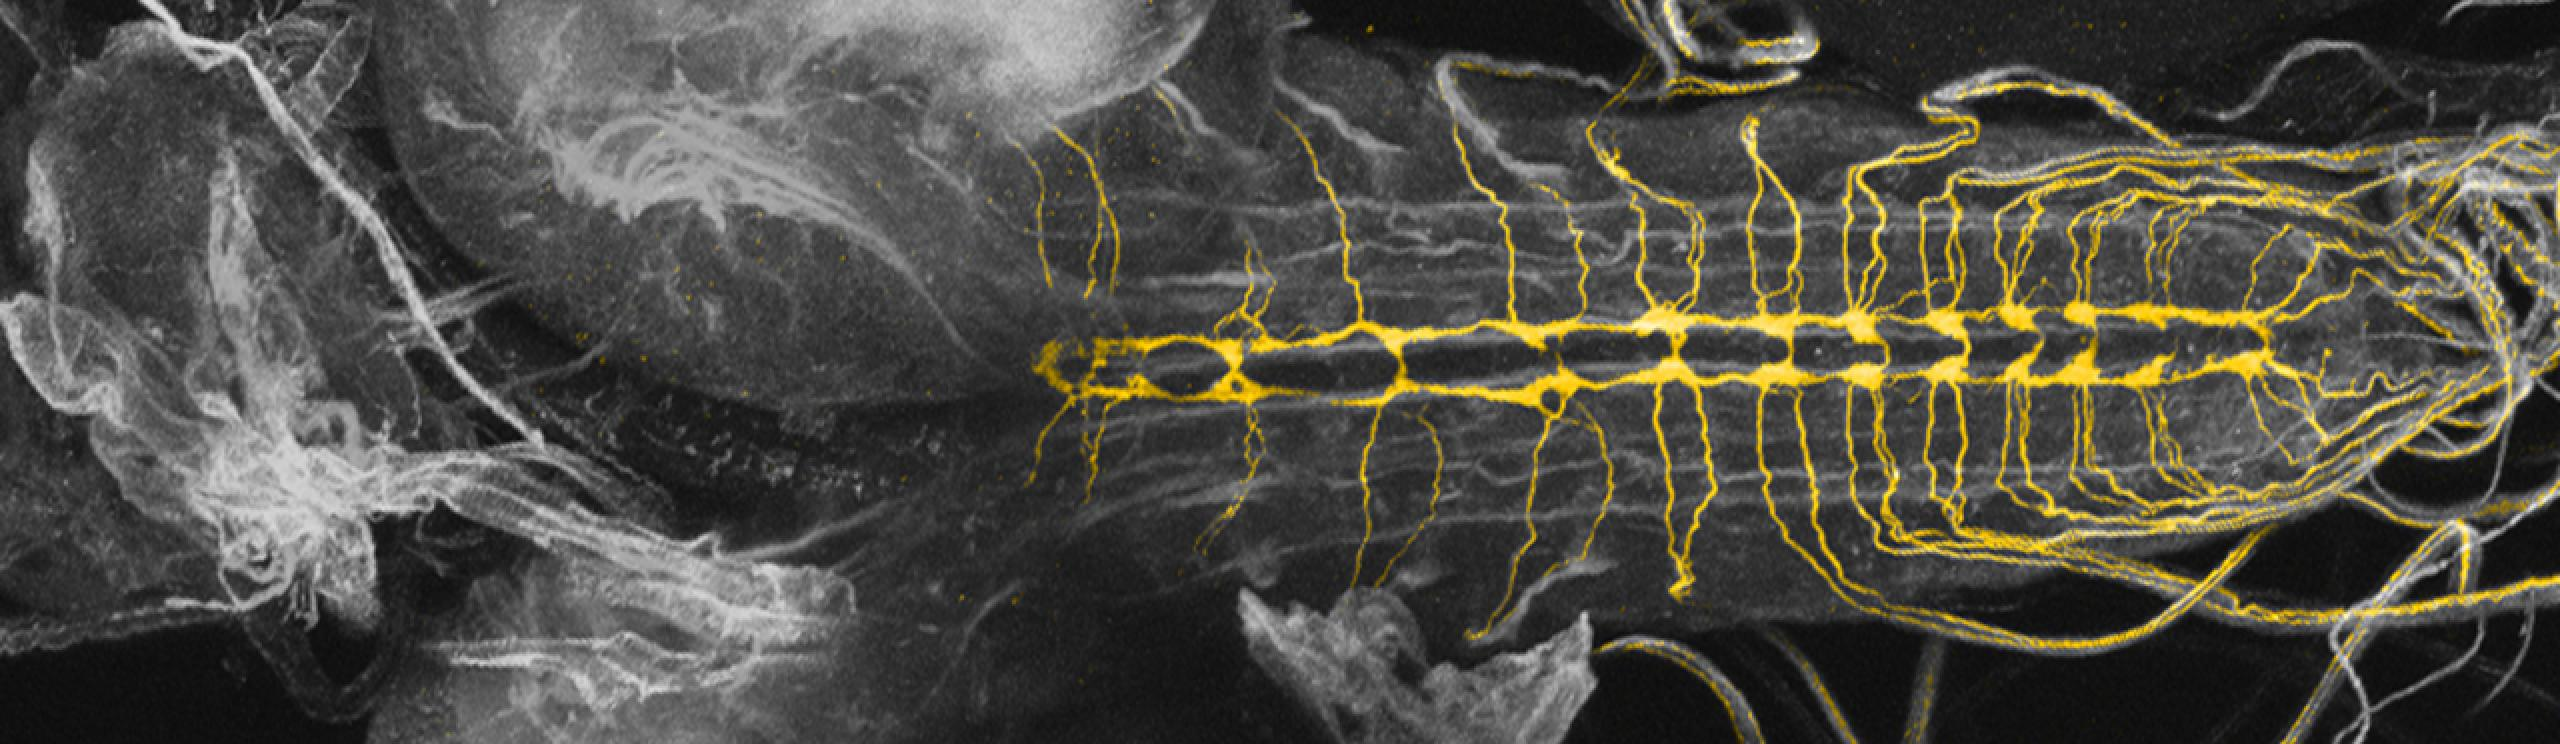 Fly nervous system